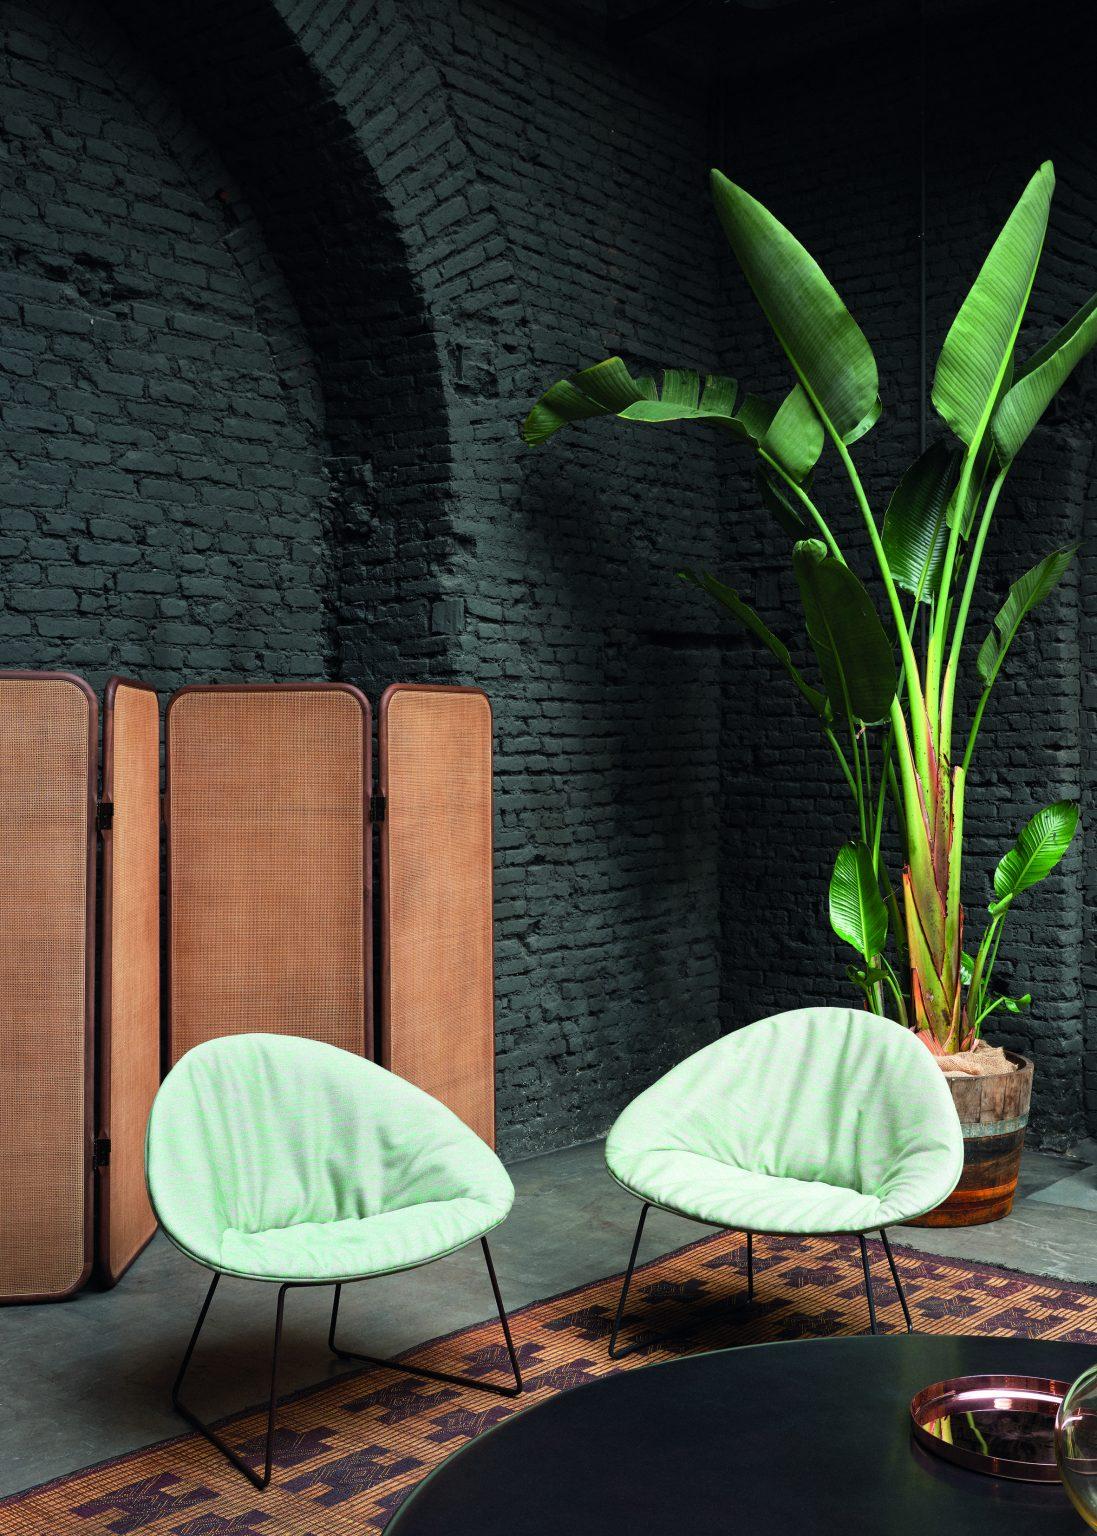 Biennale Interieur - Belgium's leading design and interior event - Arper_adell_ph_frederikvercruysse.jpg